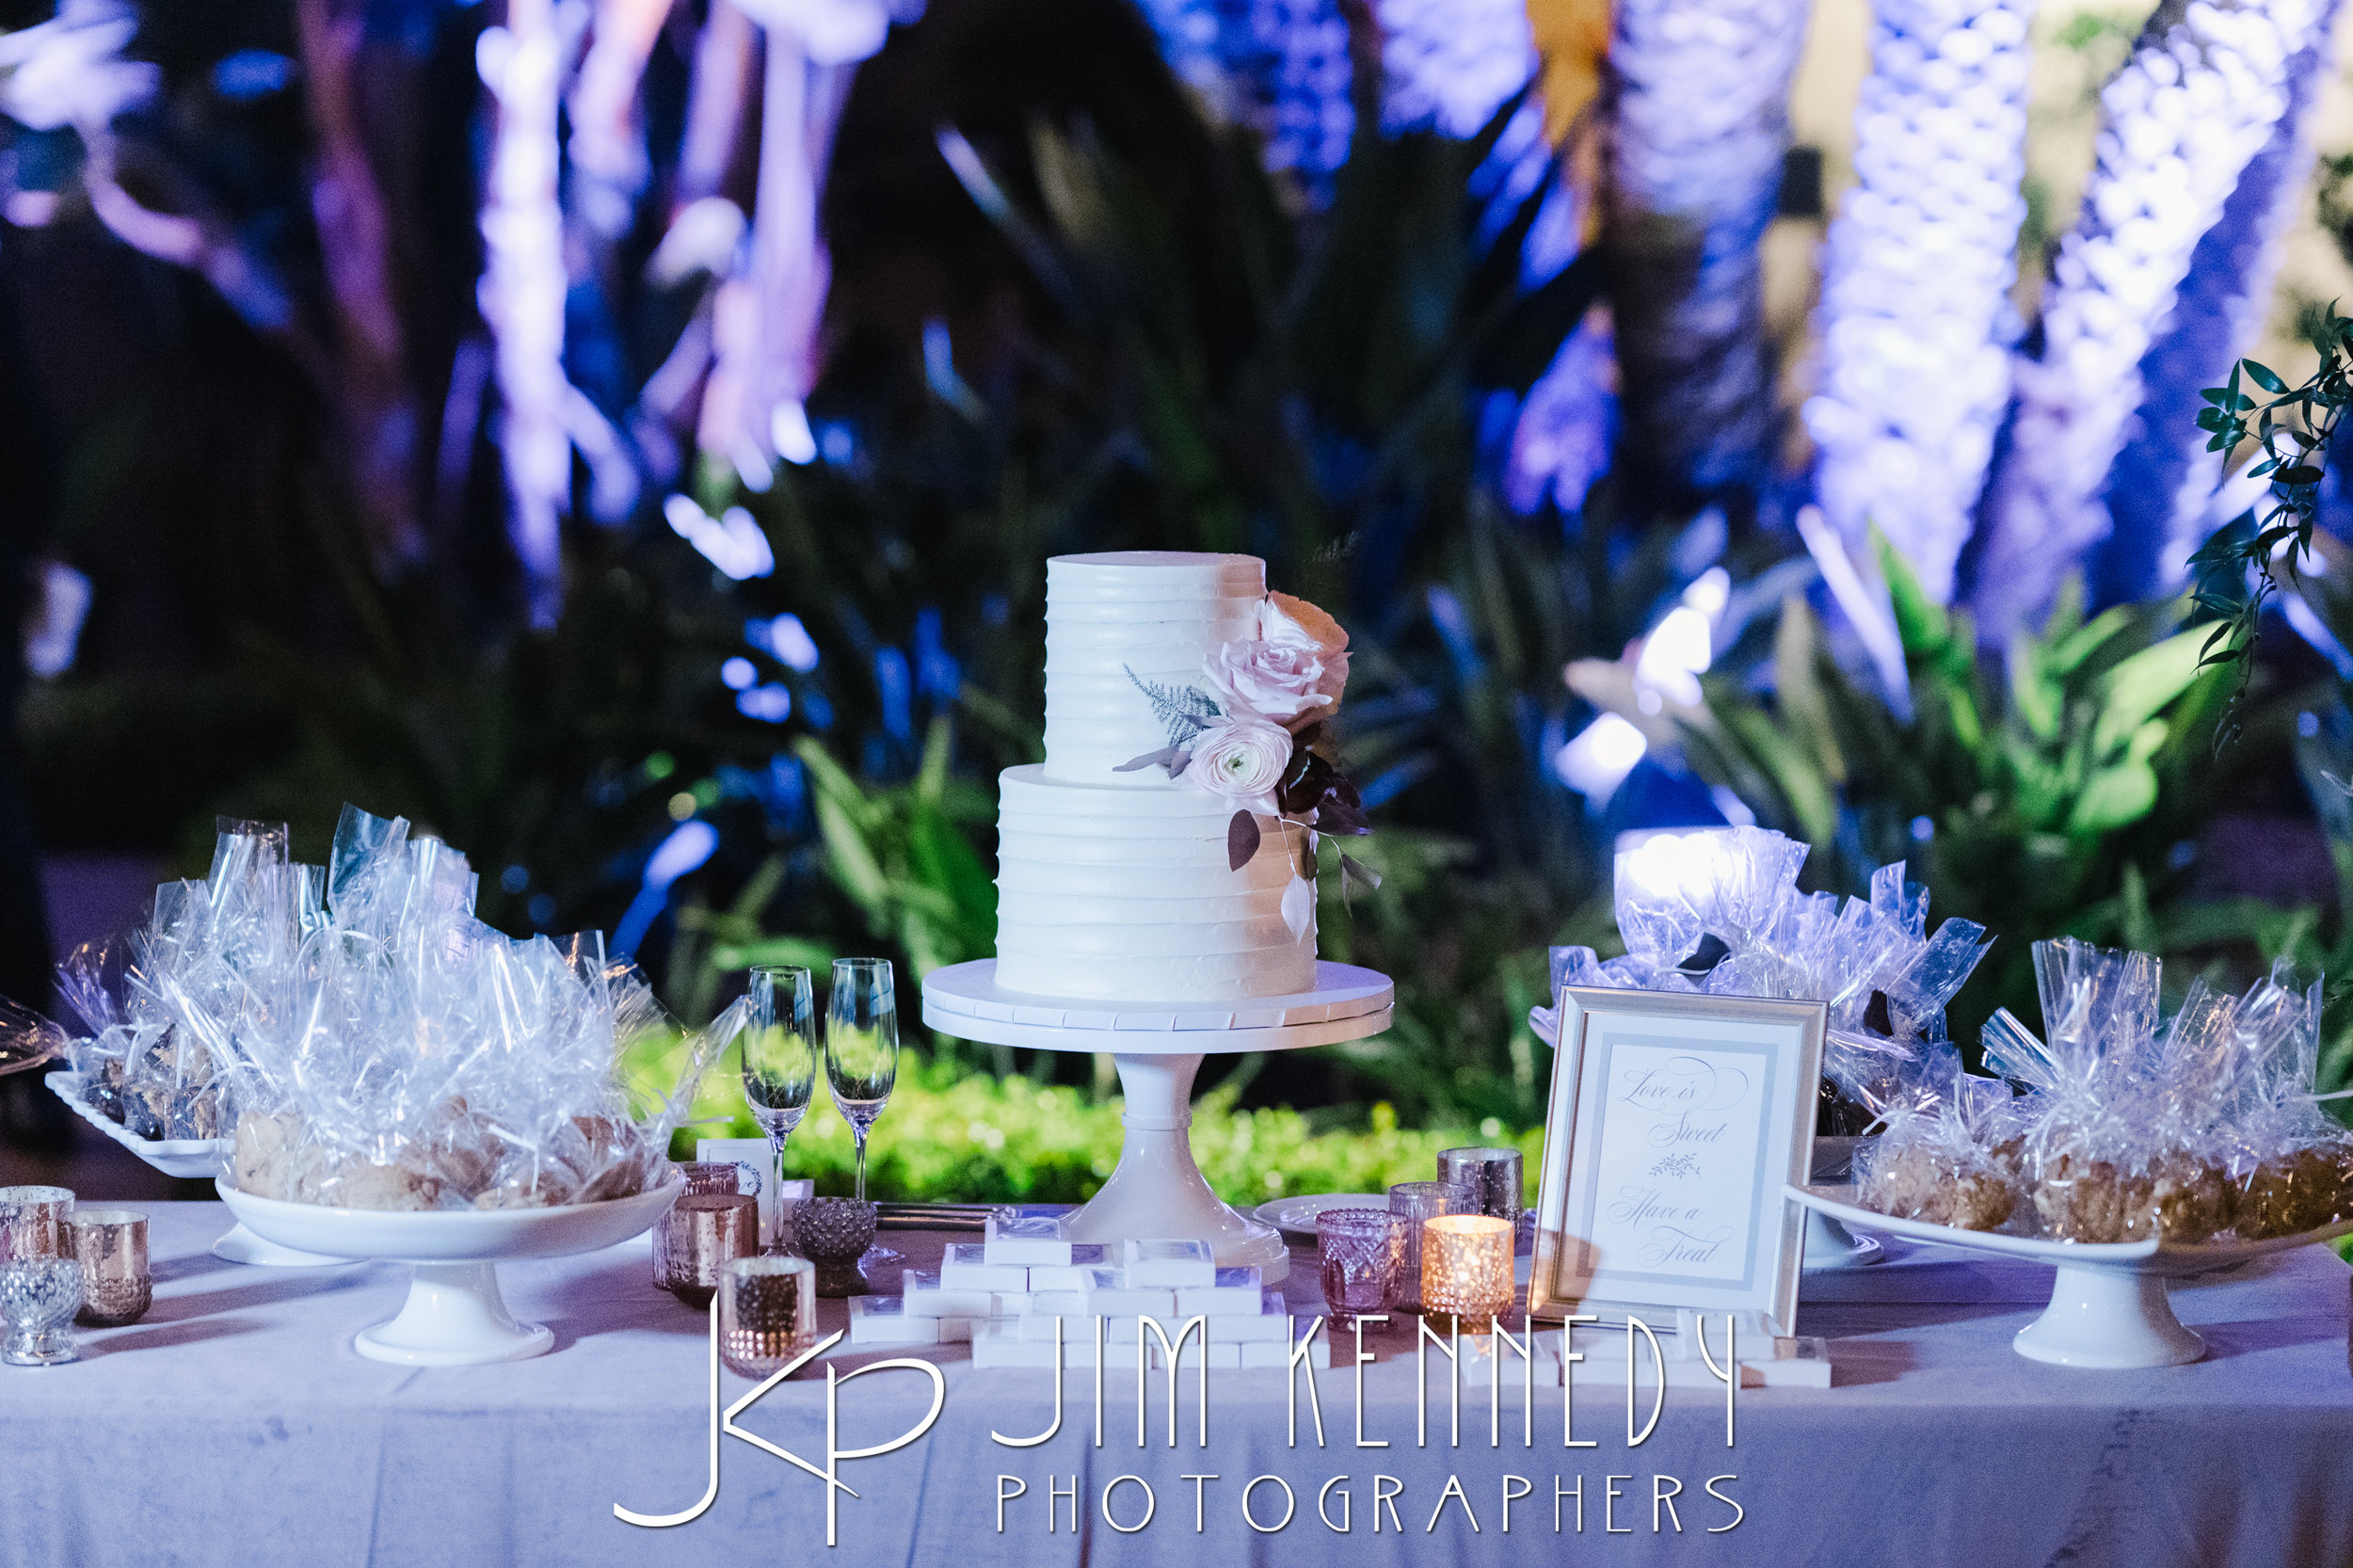 pelican-hill-wedding-jim-kenedy-photographers_0227.JPG